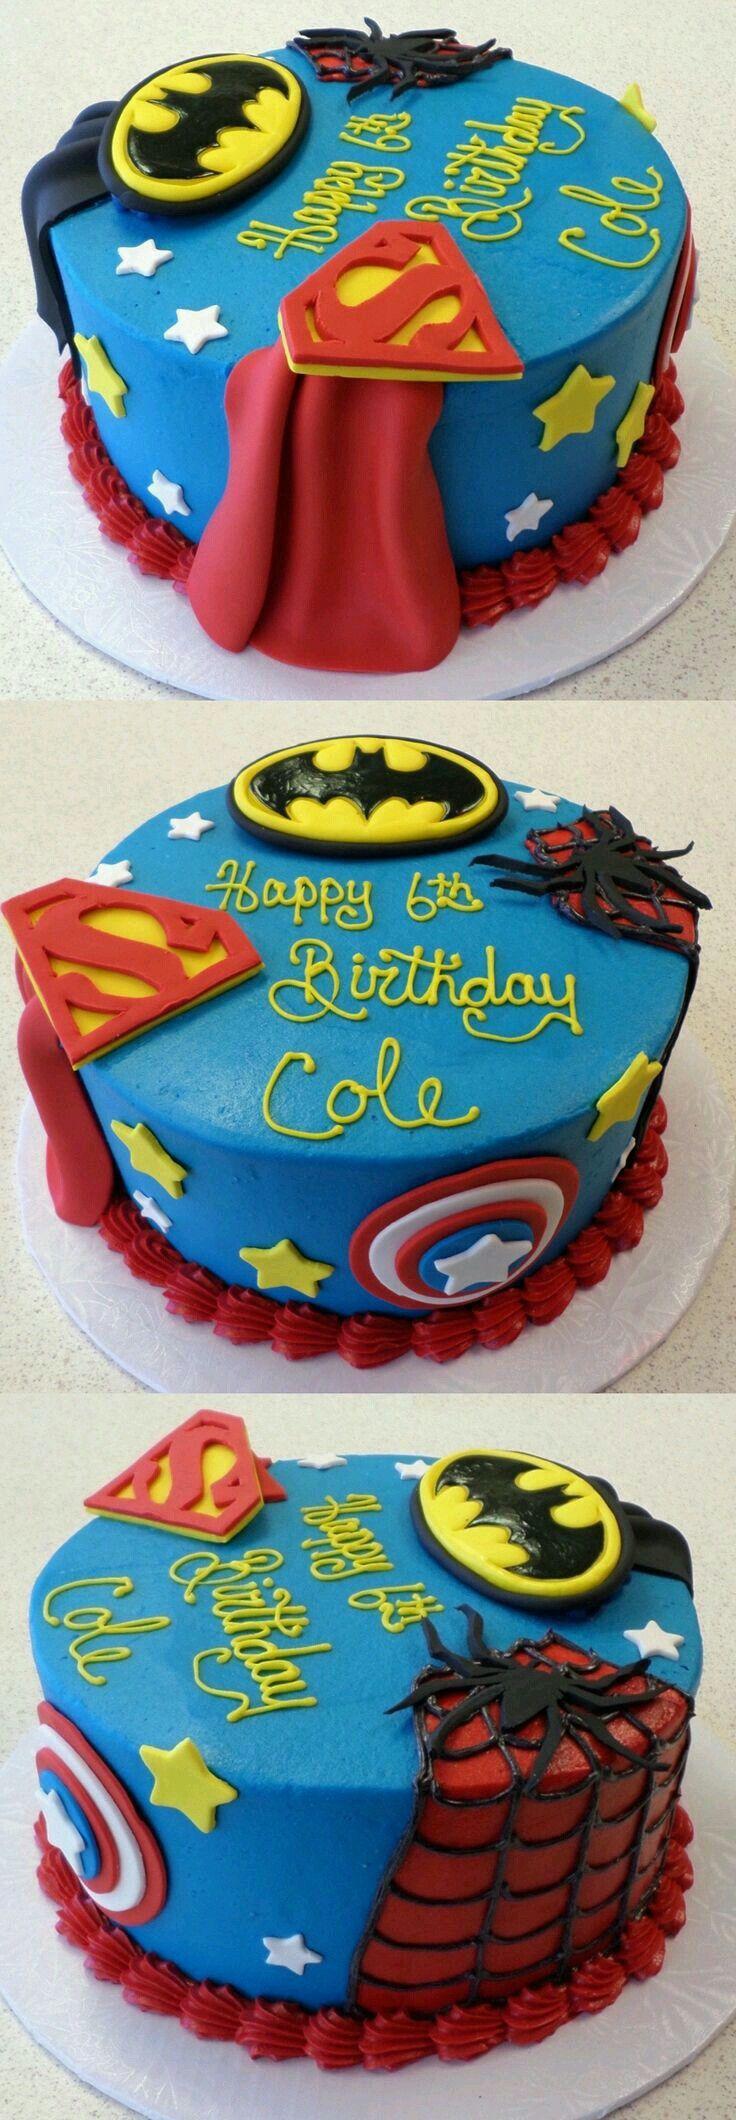 14 best boys cake images on Pinterest Birthday ideas 30th